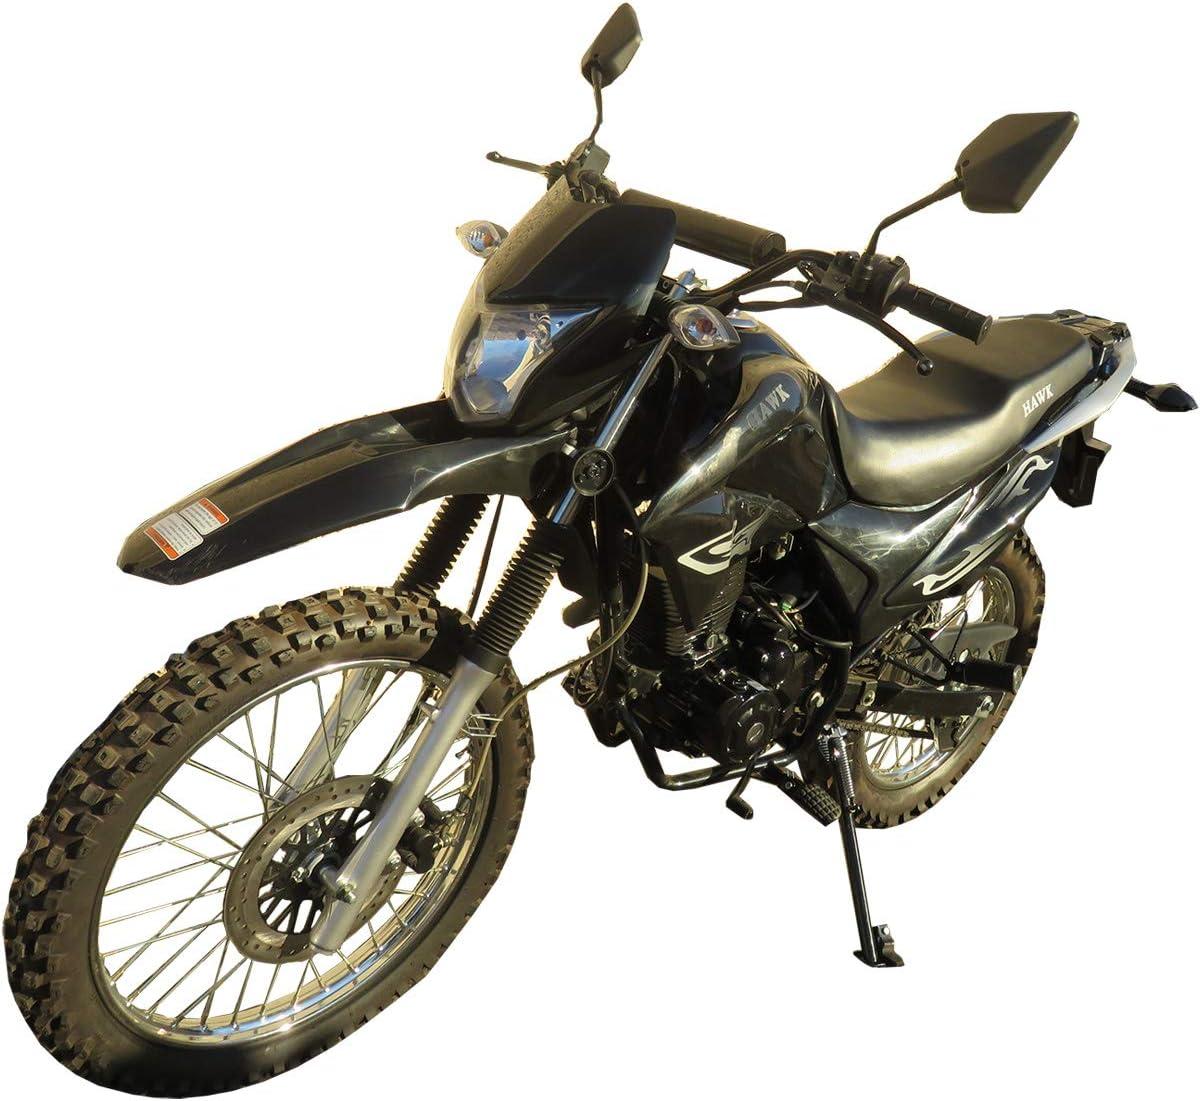 RPS 250cc Dirt Bike